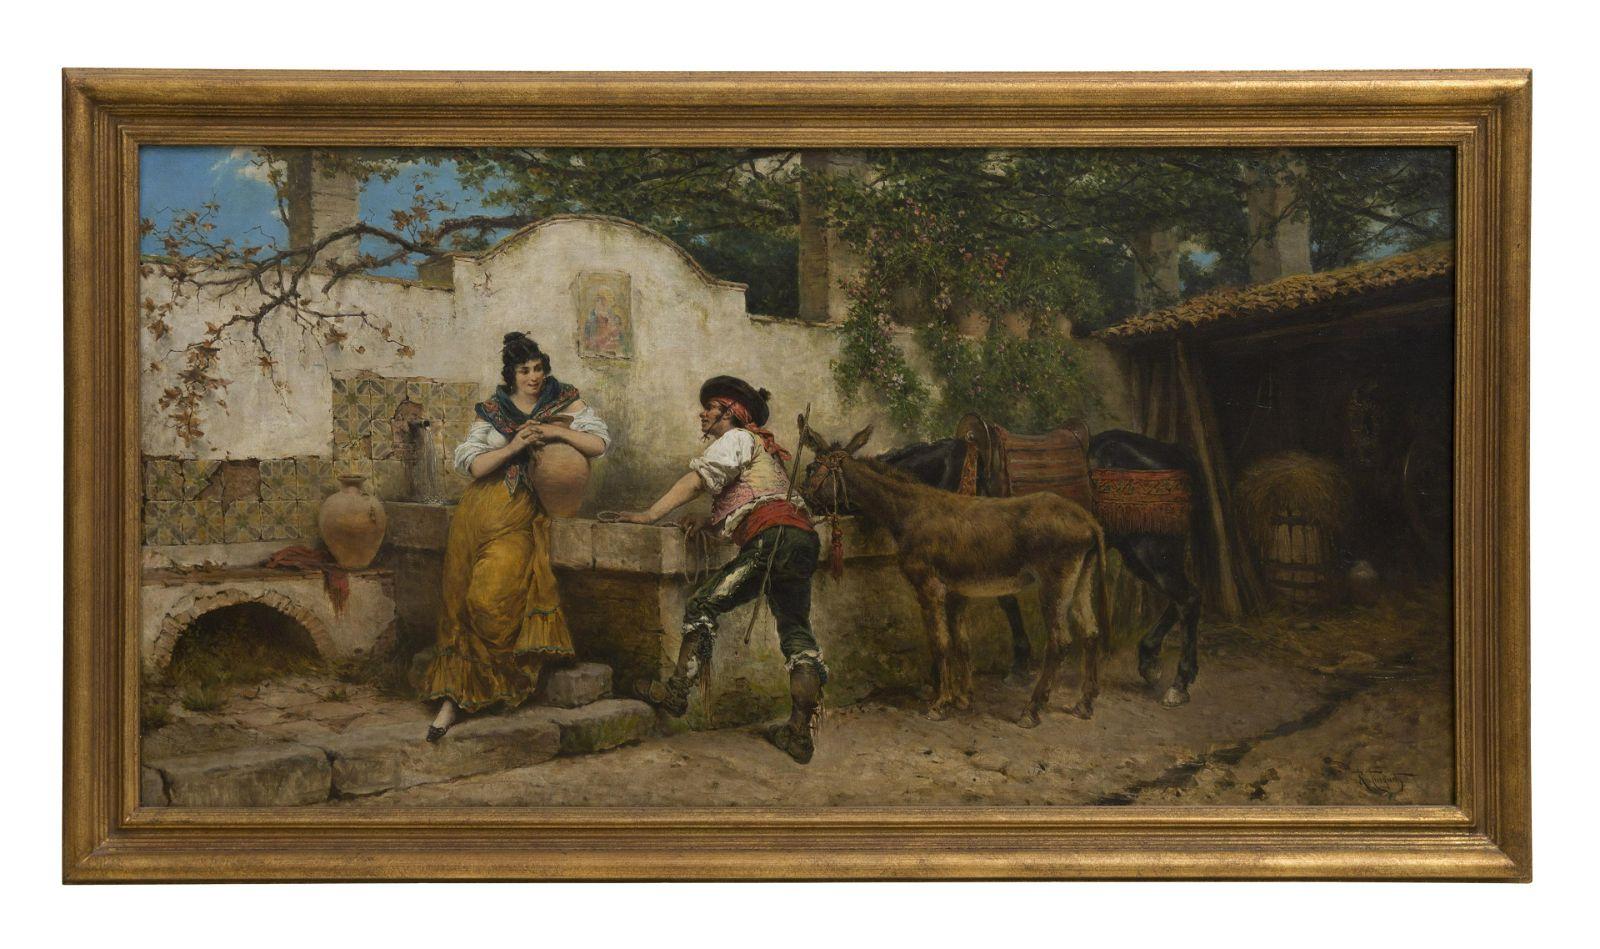 Ramon Tusquets Y Maignon (1839-1904) Oil (Spain, Italy)